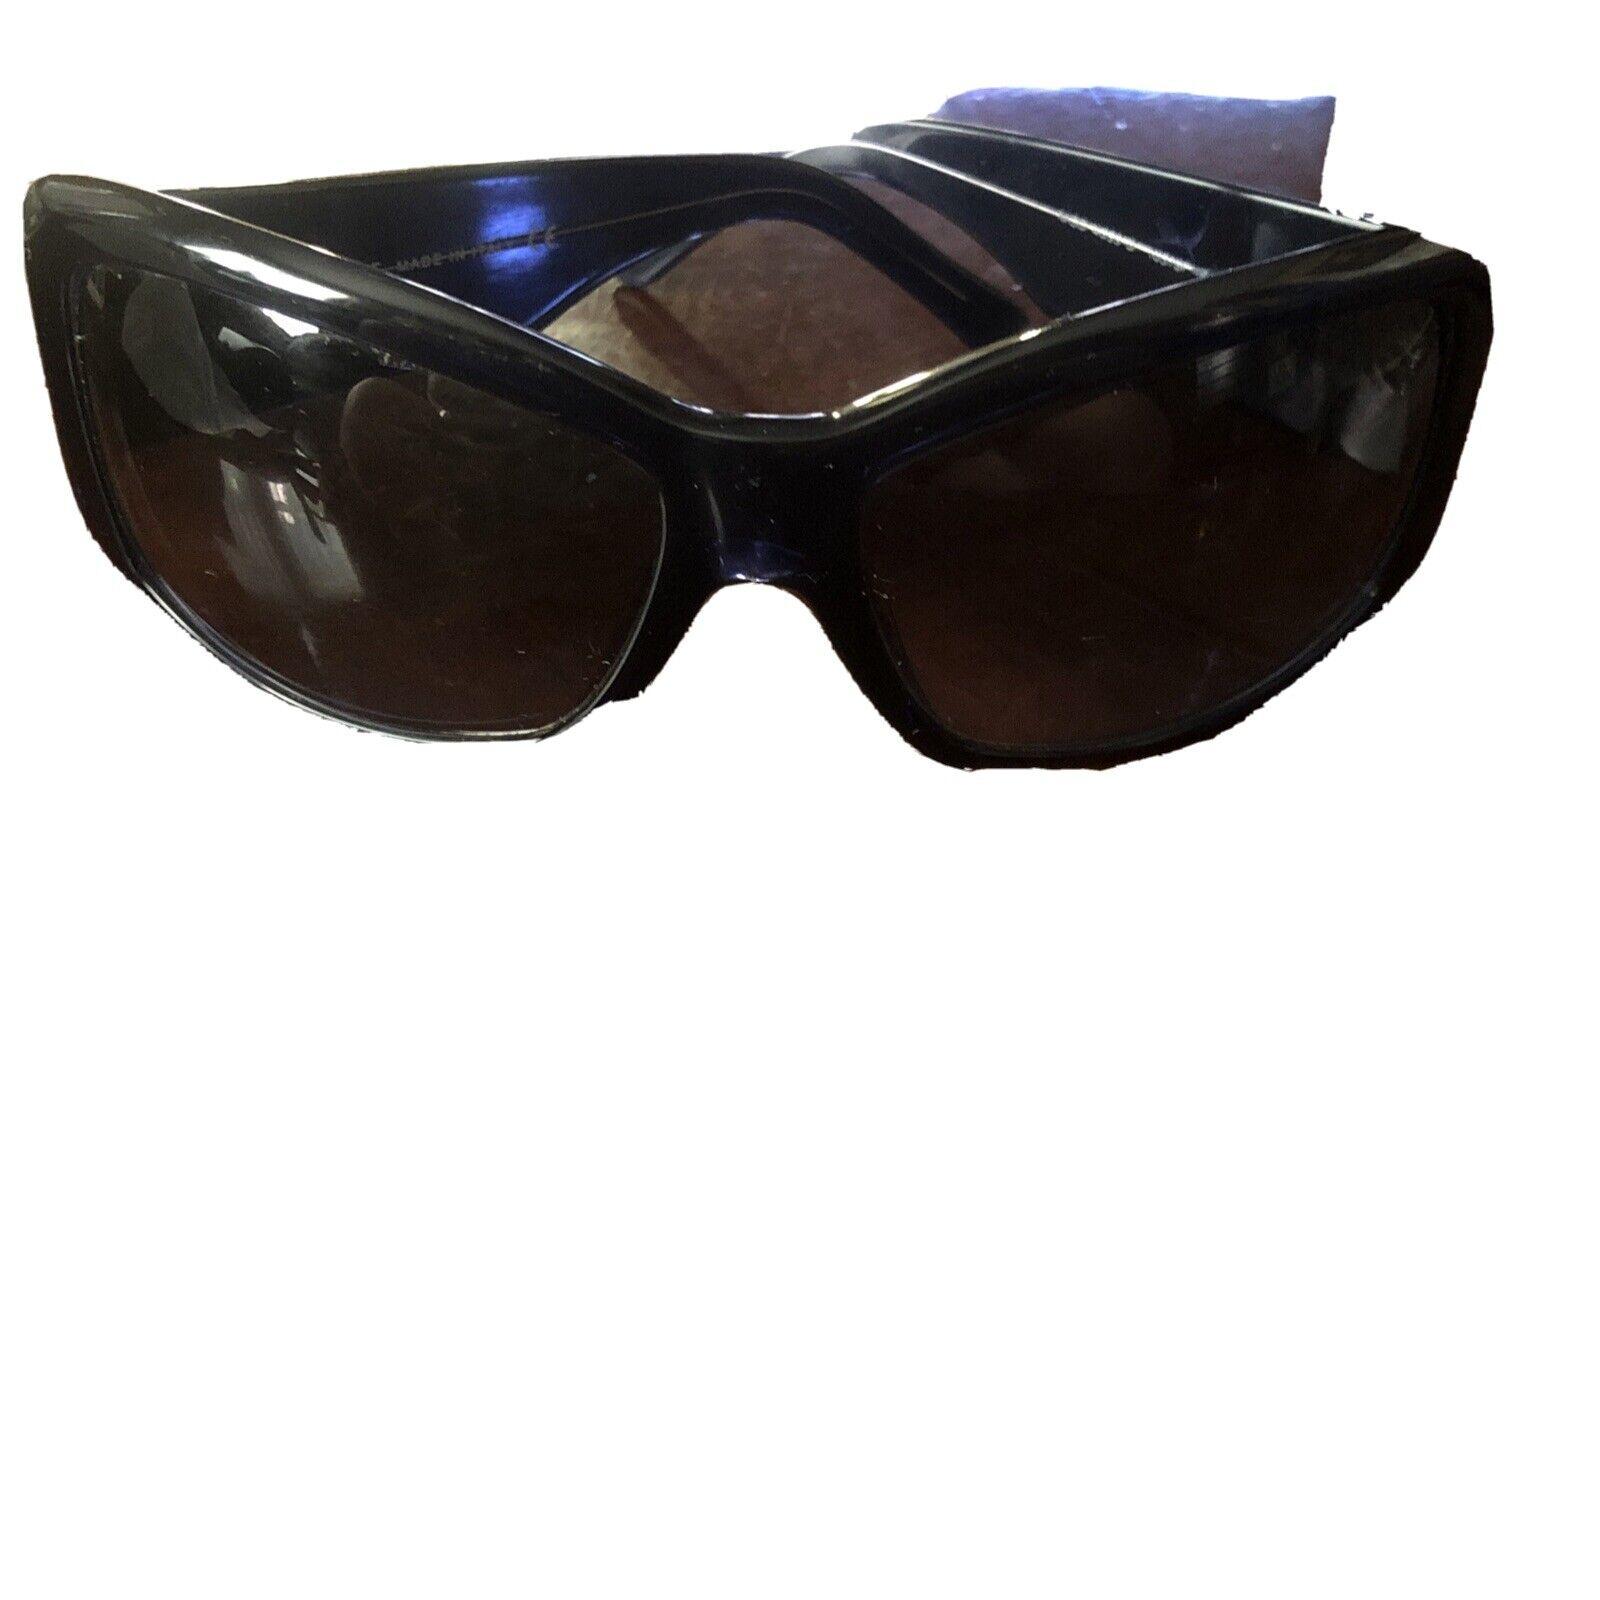 gianni versace sunglasses - image 1